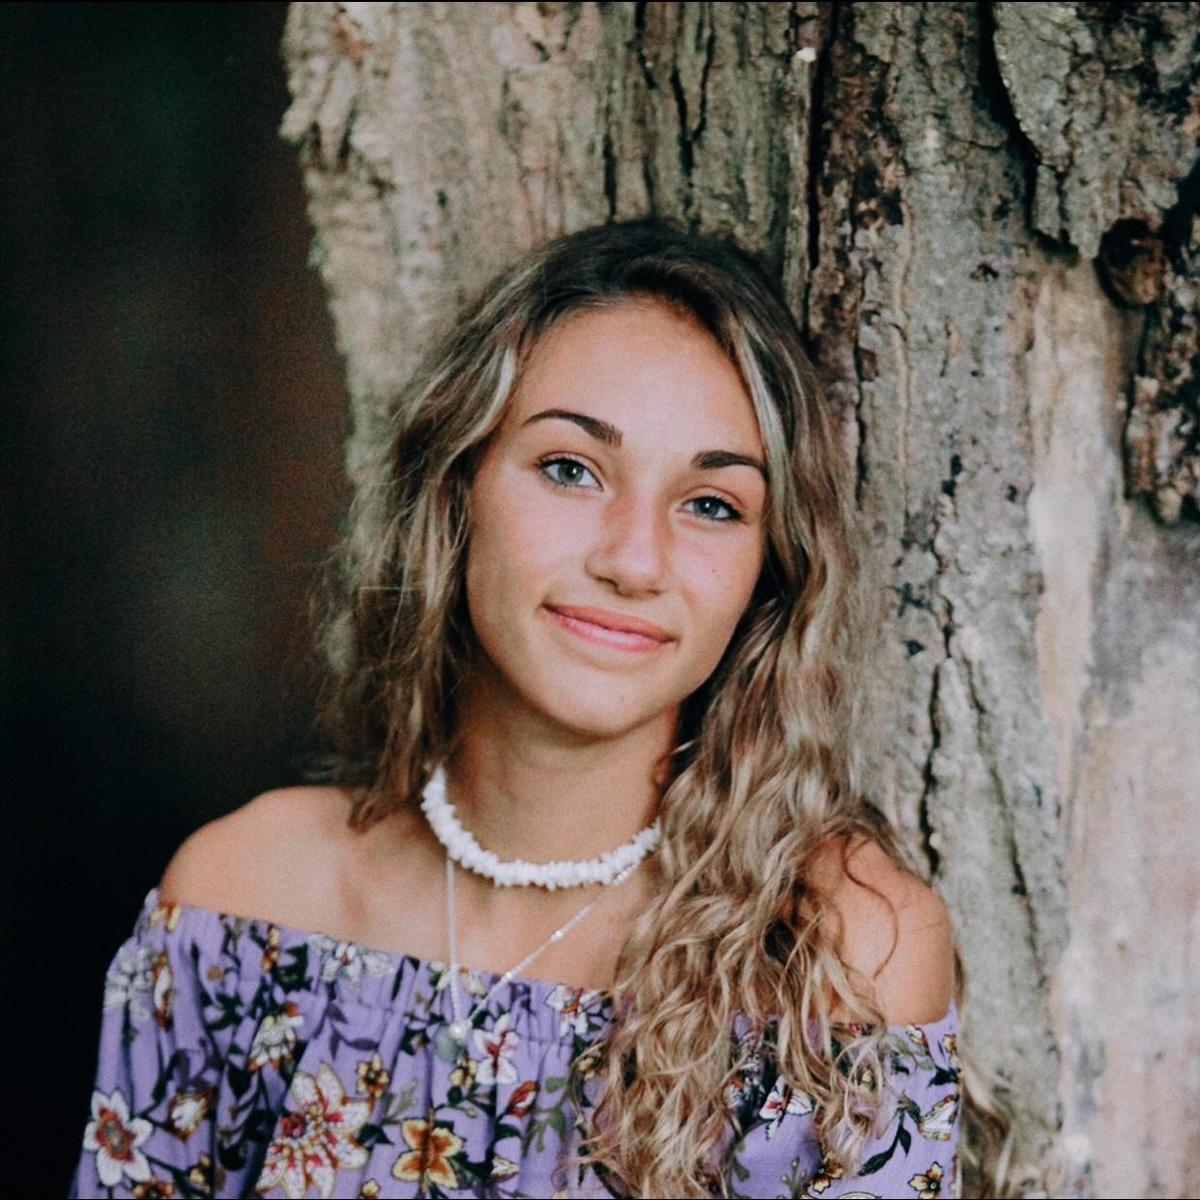 Portrait of Abby